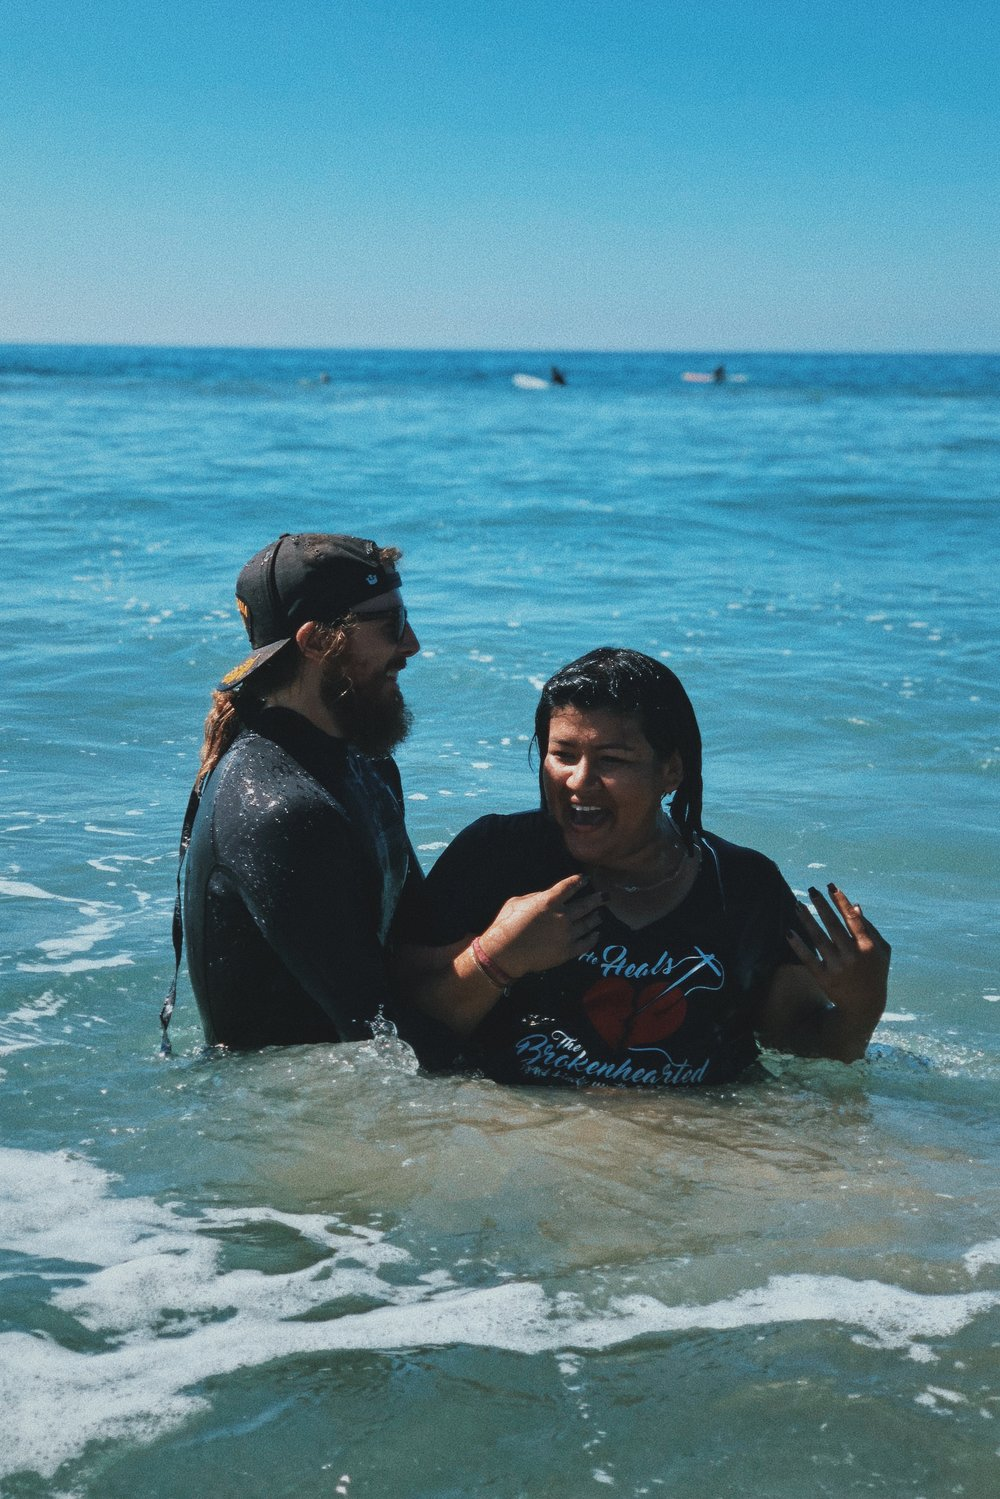 malibu-beach-baptism-mission-hills-christian-church-18.jpg